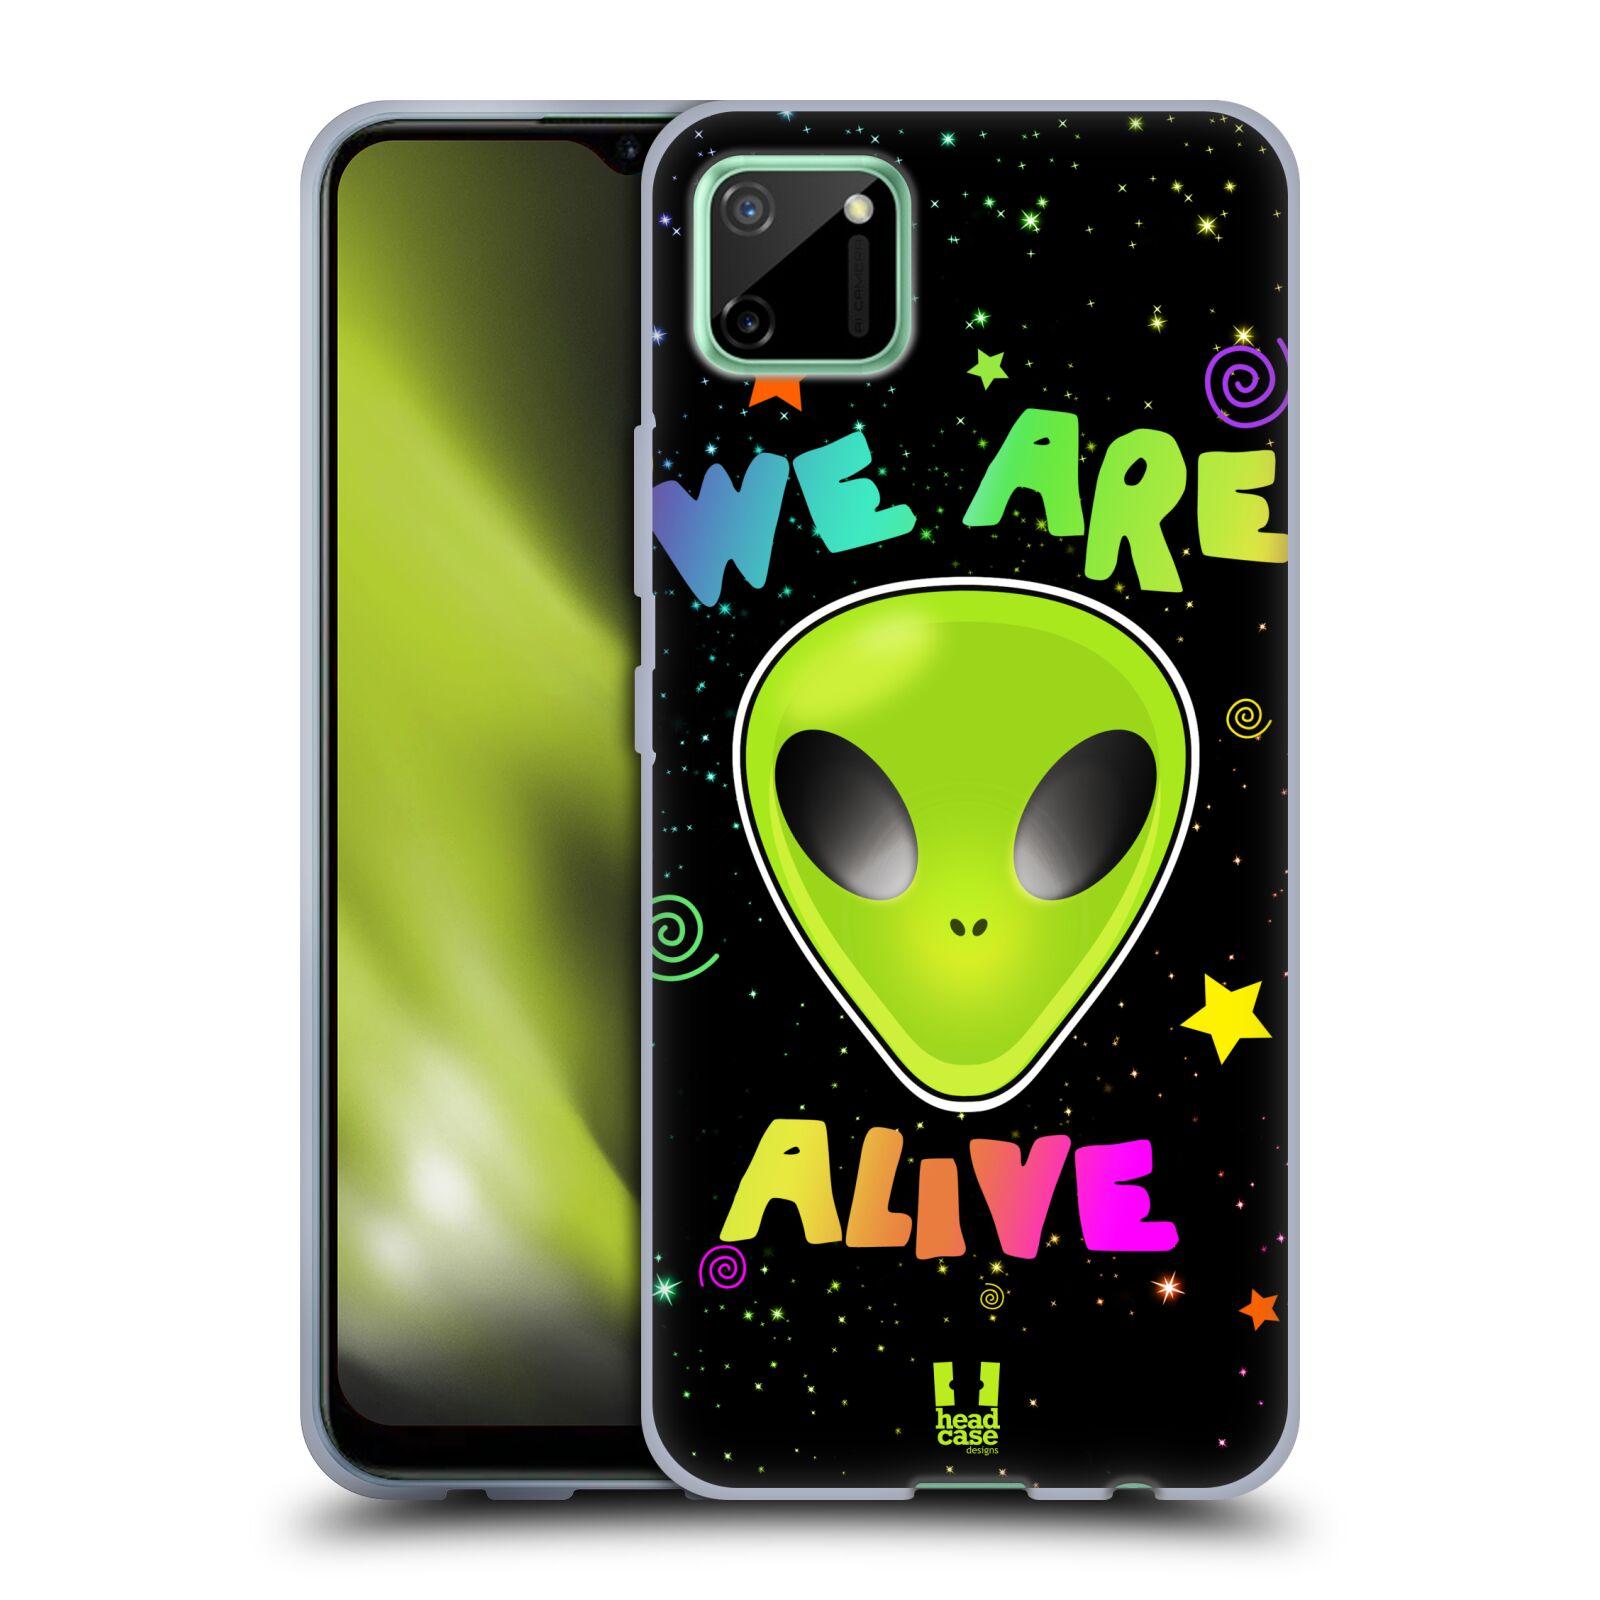 Silikonové pouzdro na mobil Realme C11 - Head Case - ALIENS ALIVE